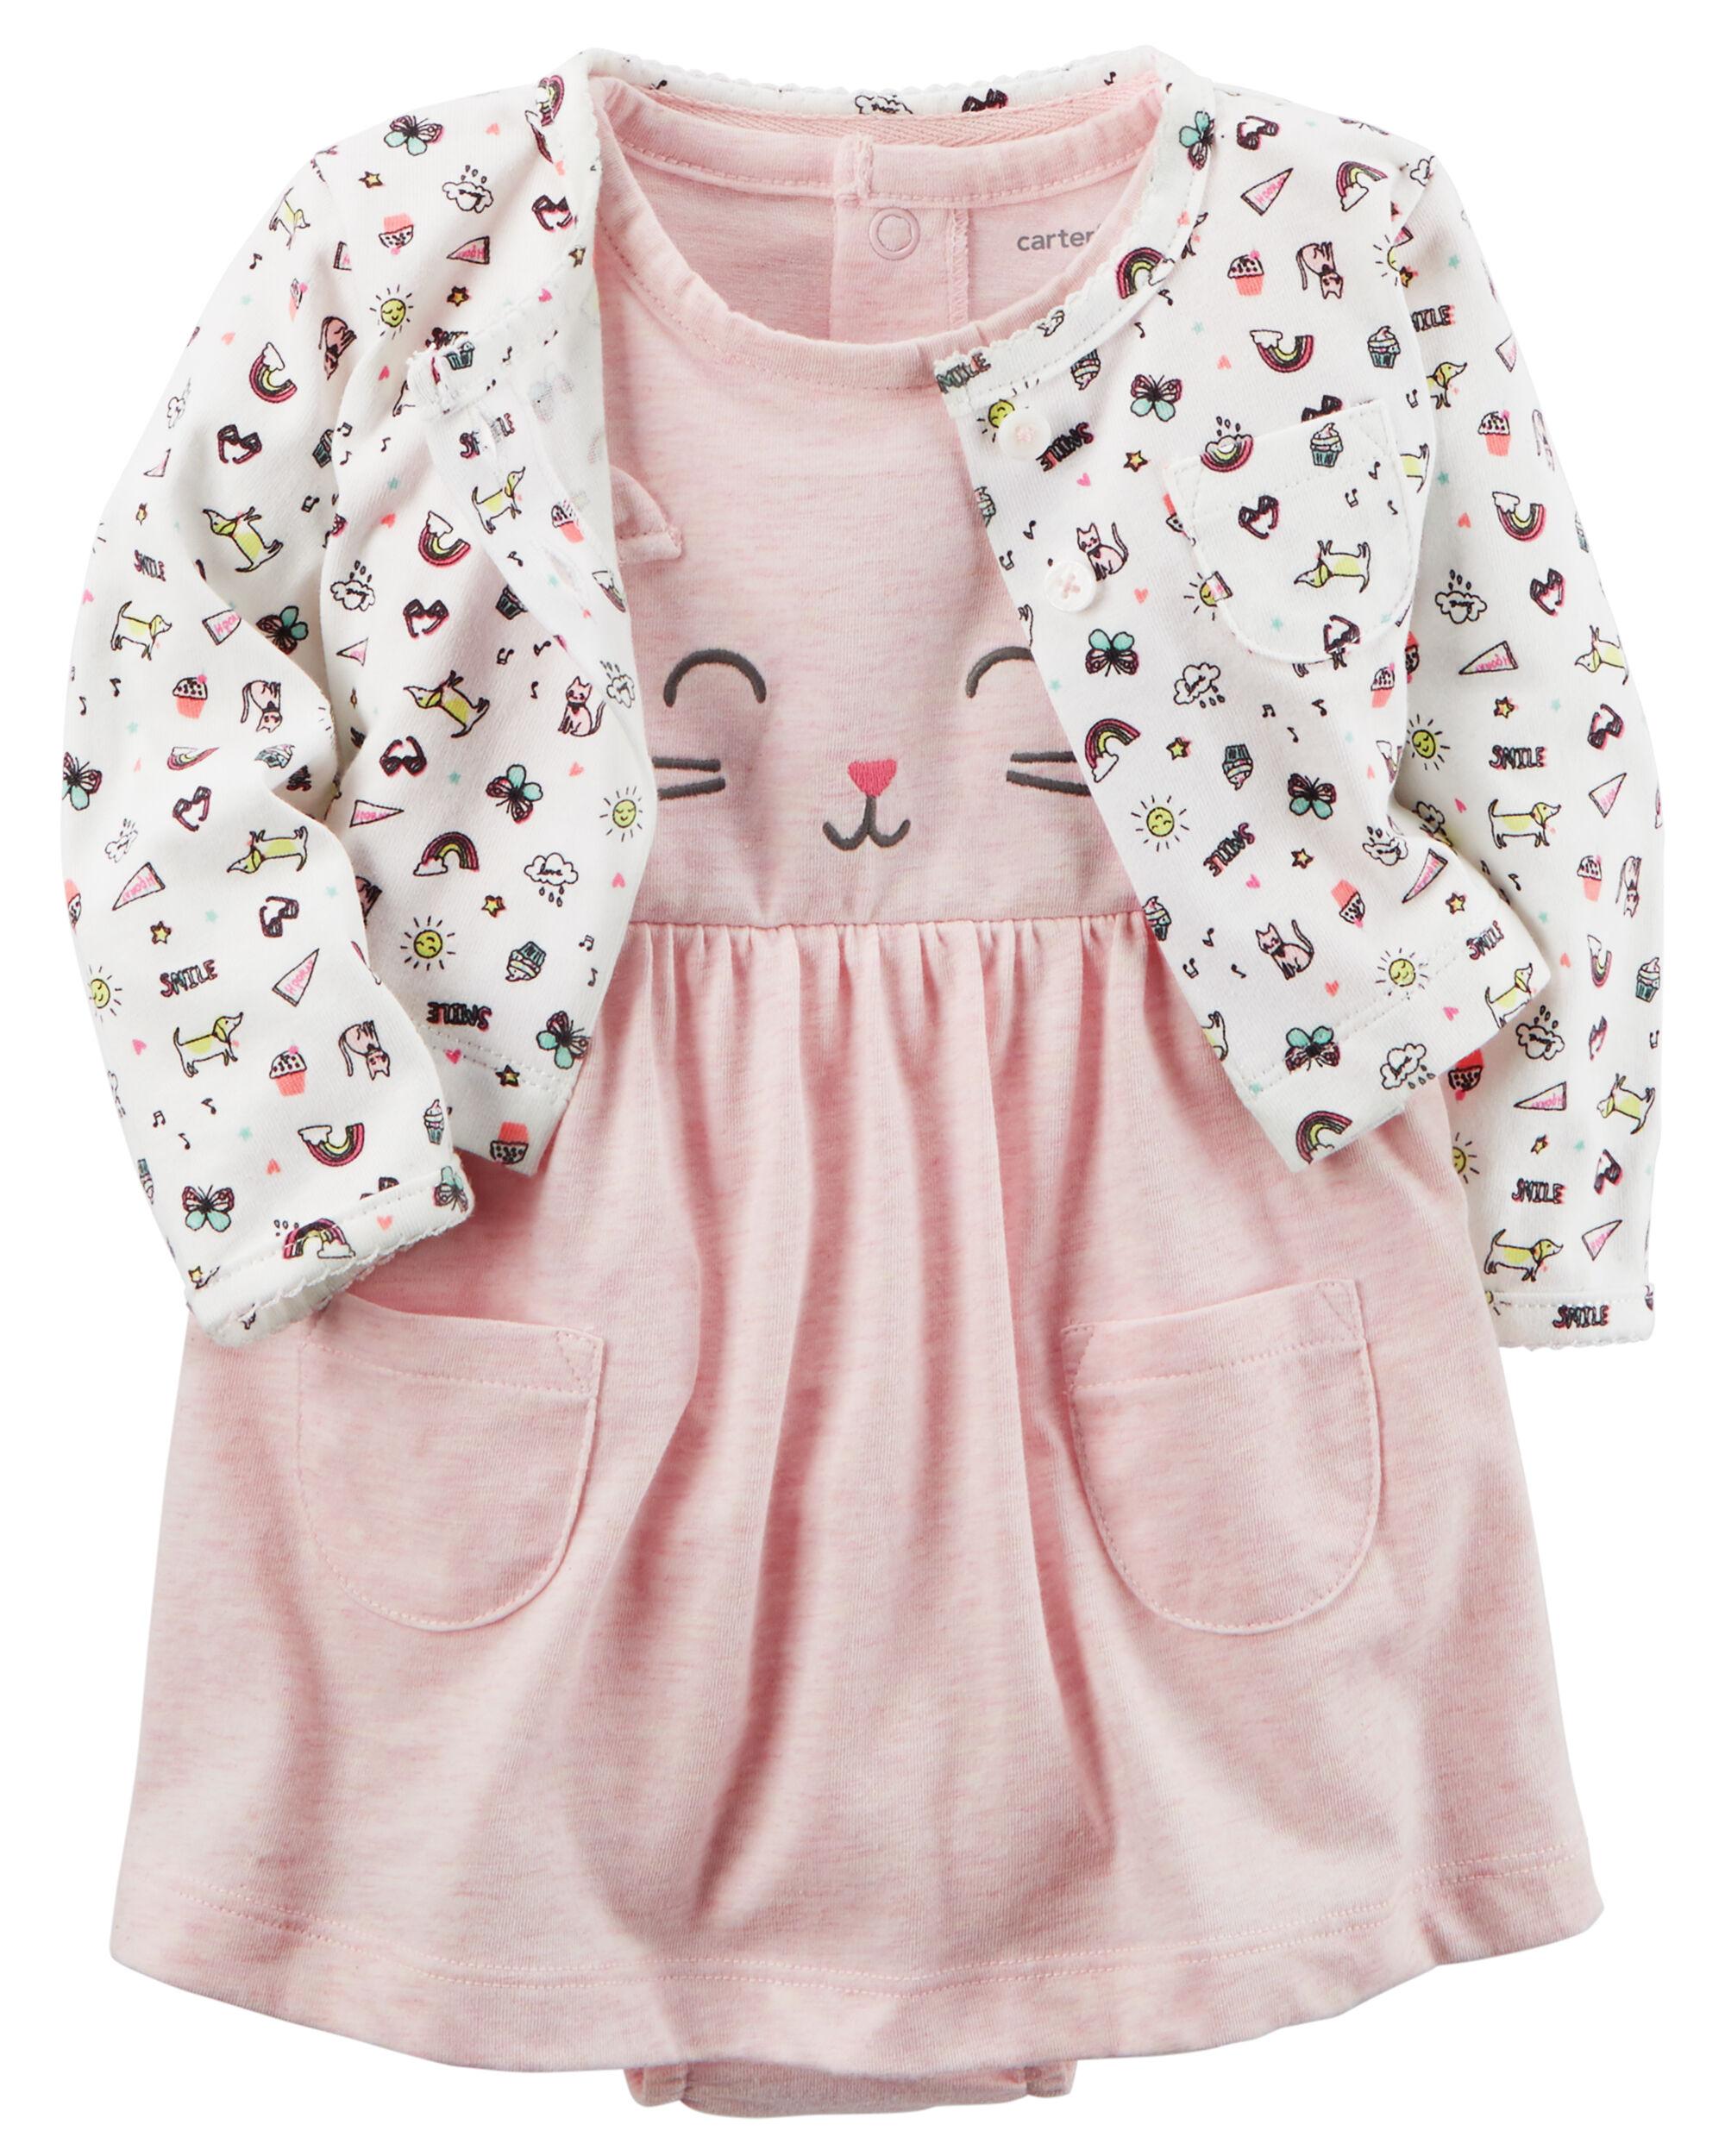 2 Piece Heathered Bodysuit Dress & Cardigan Set  